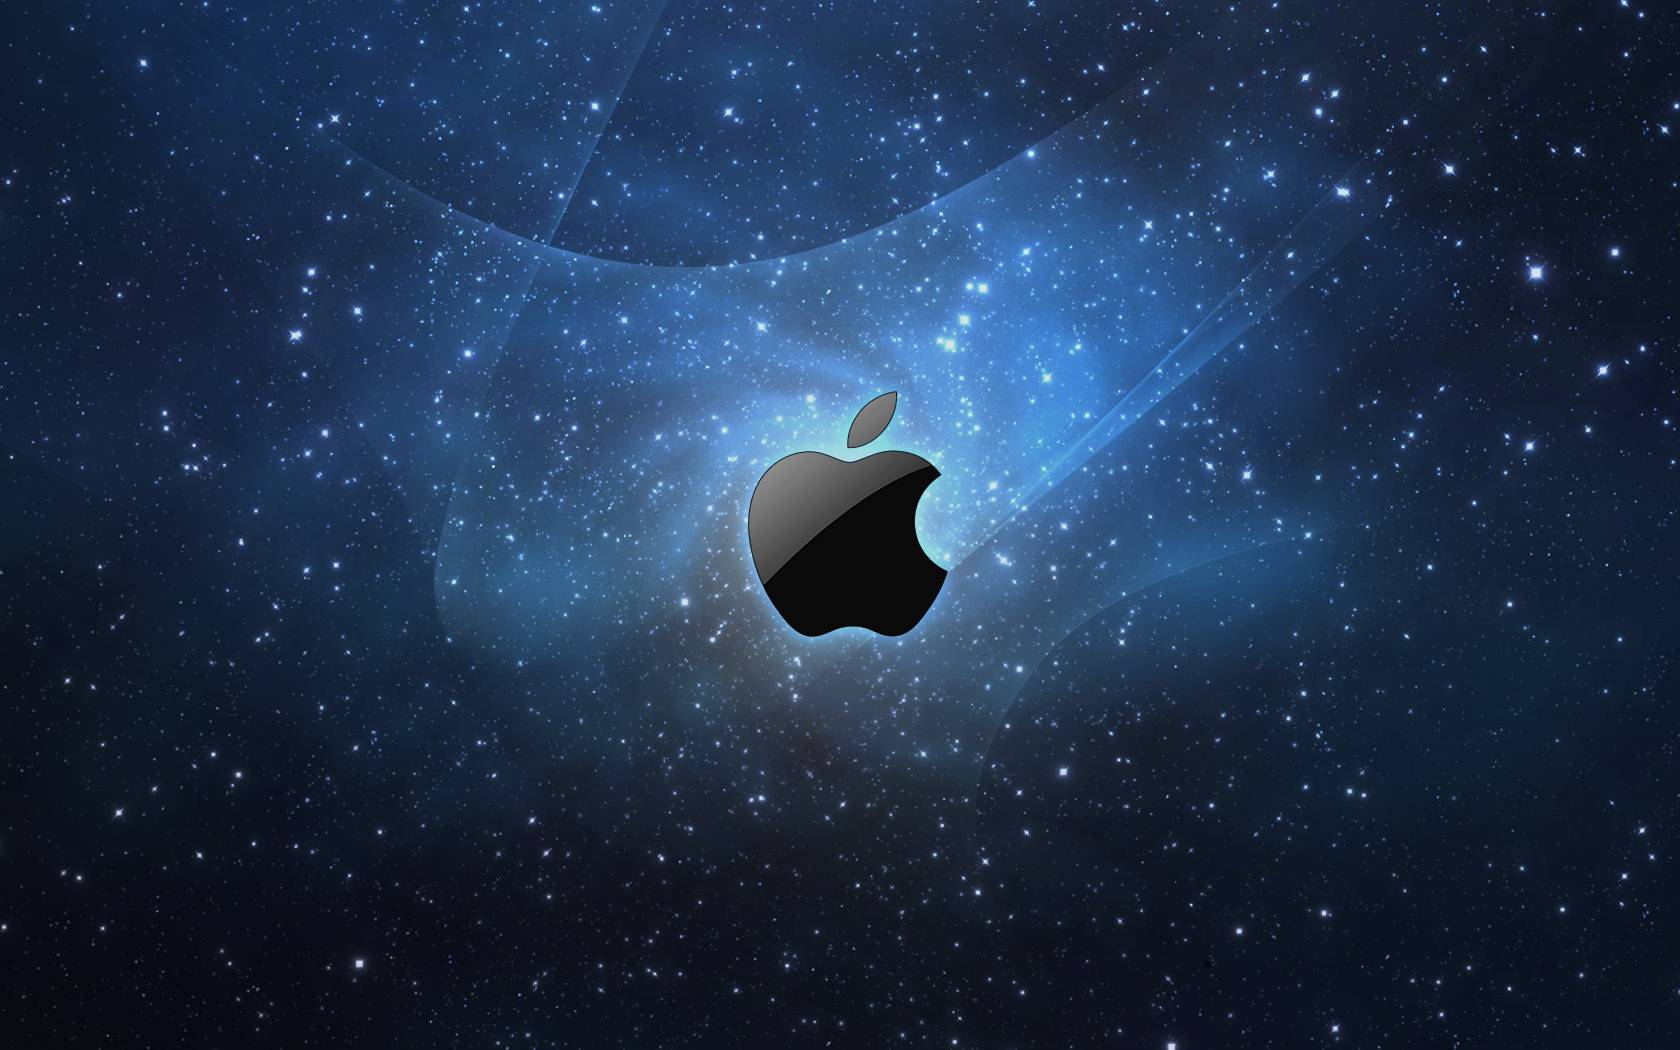 Apple Desktop Backgrounds Wallpaper Cave